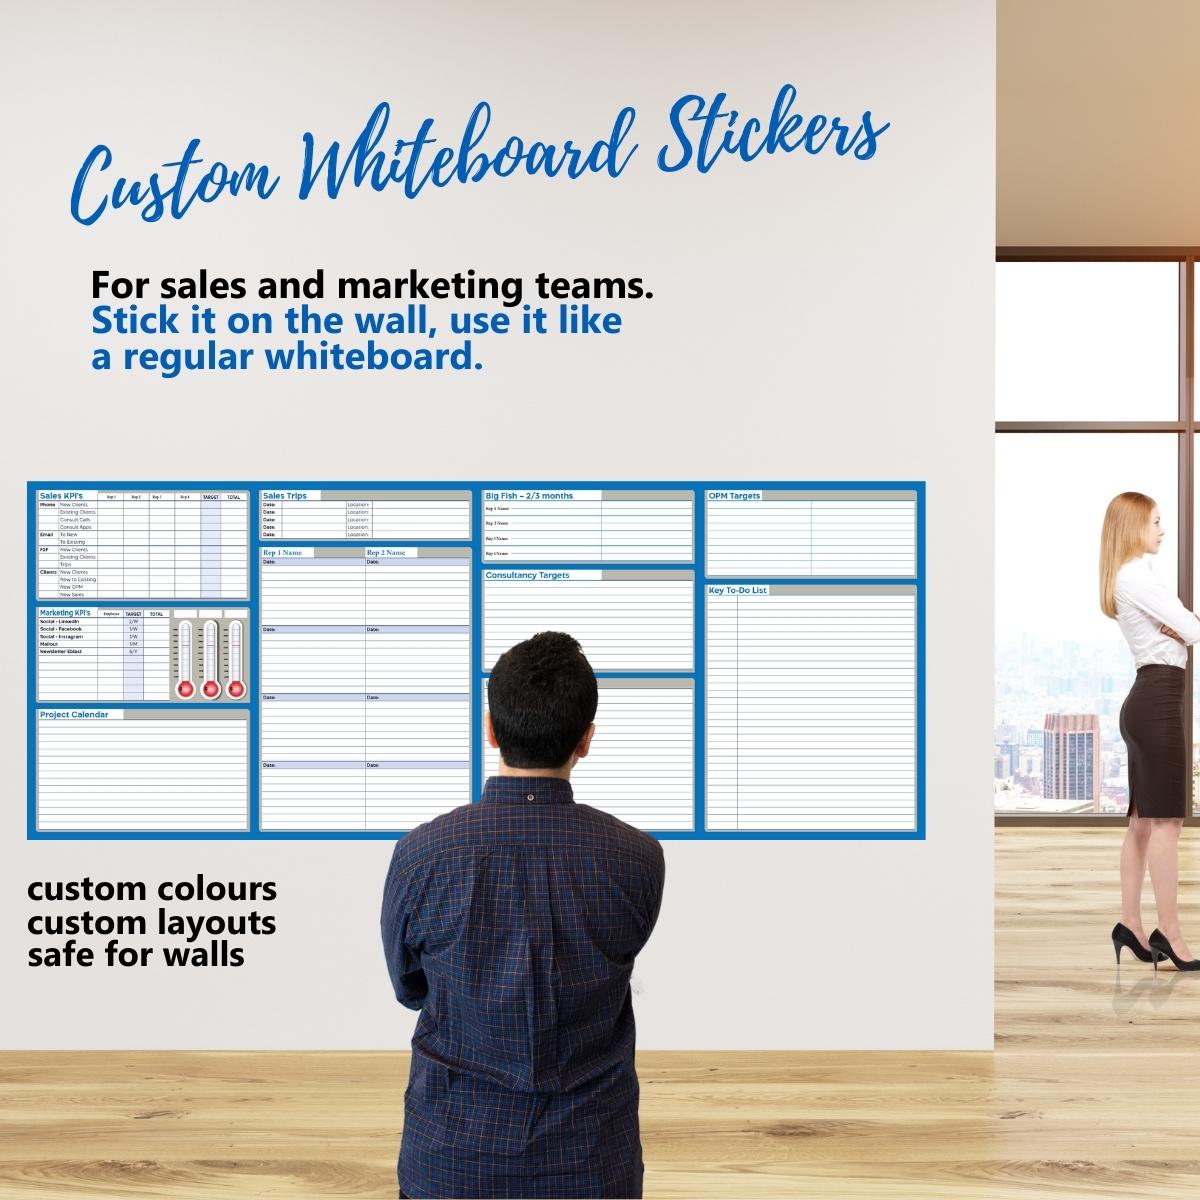 Custom Whiteboard Stickers